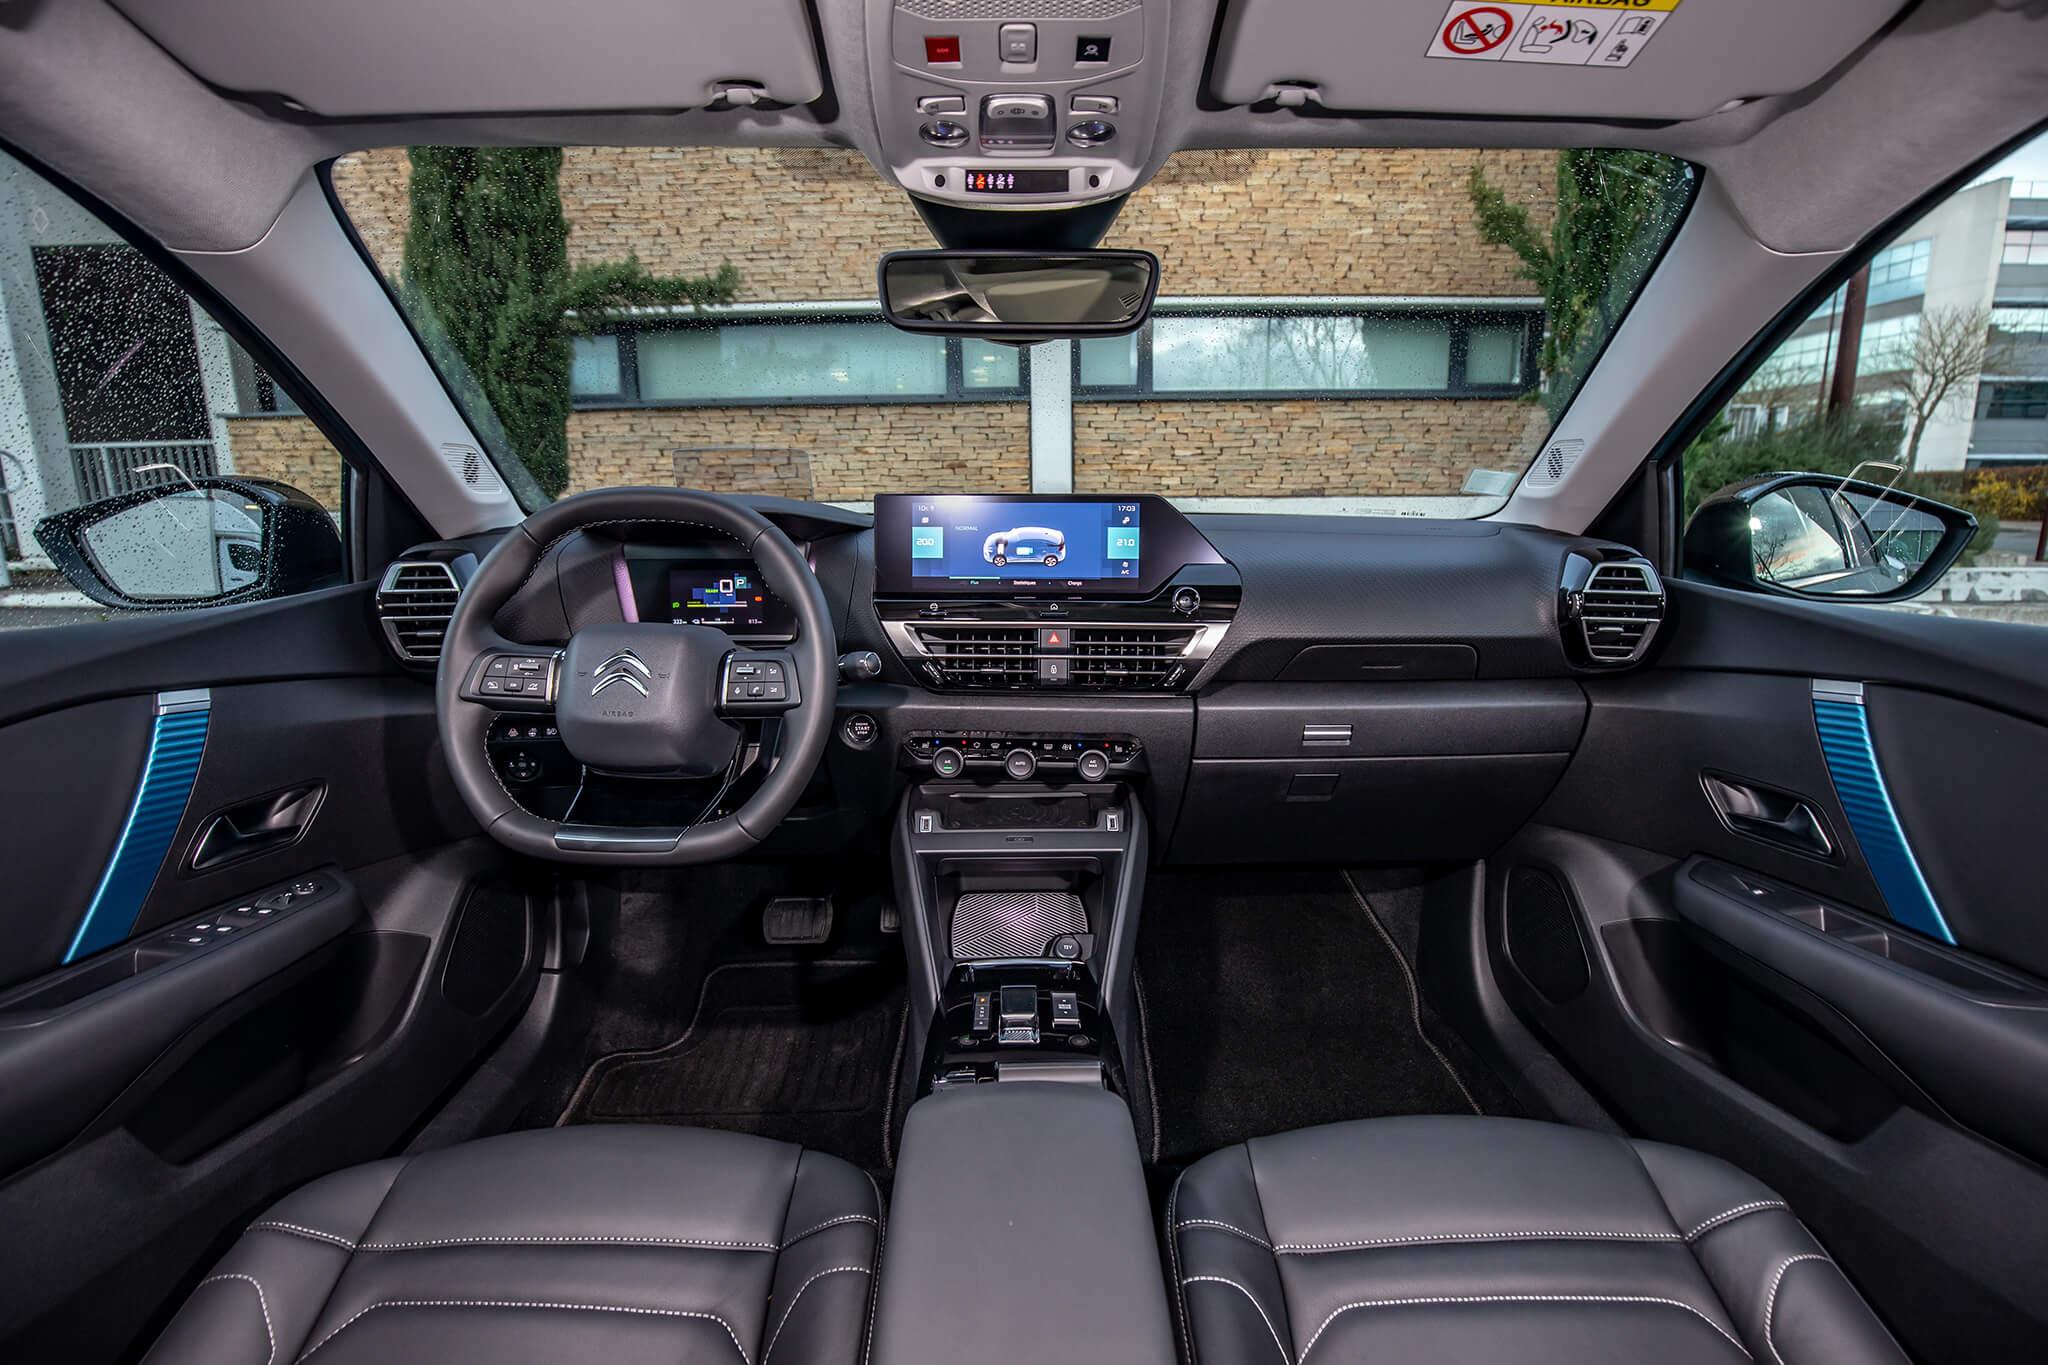 Tabliê Citroën C4